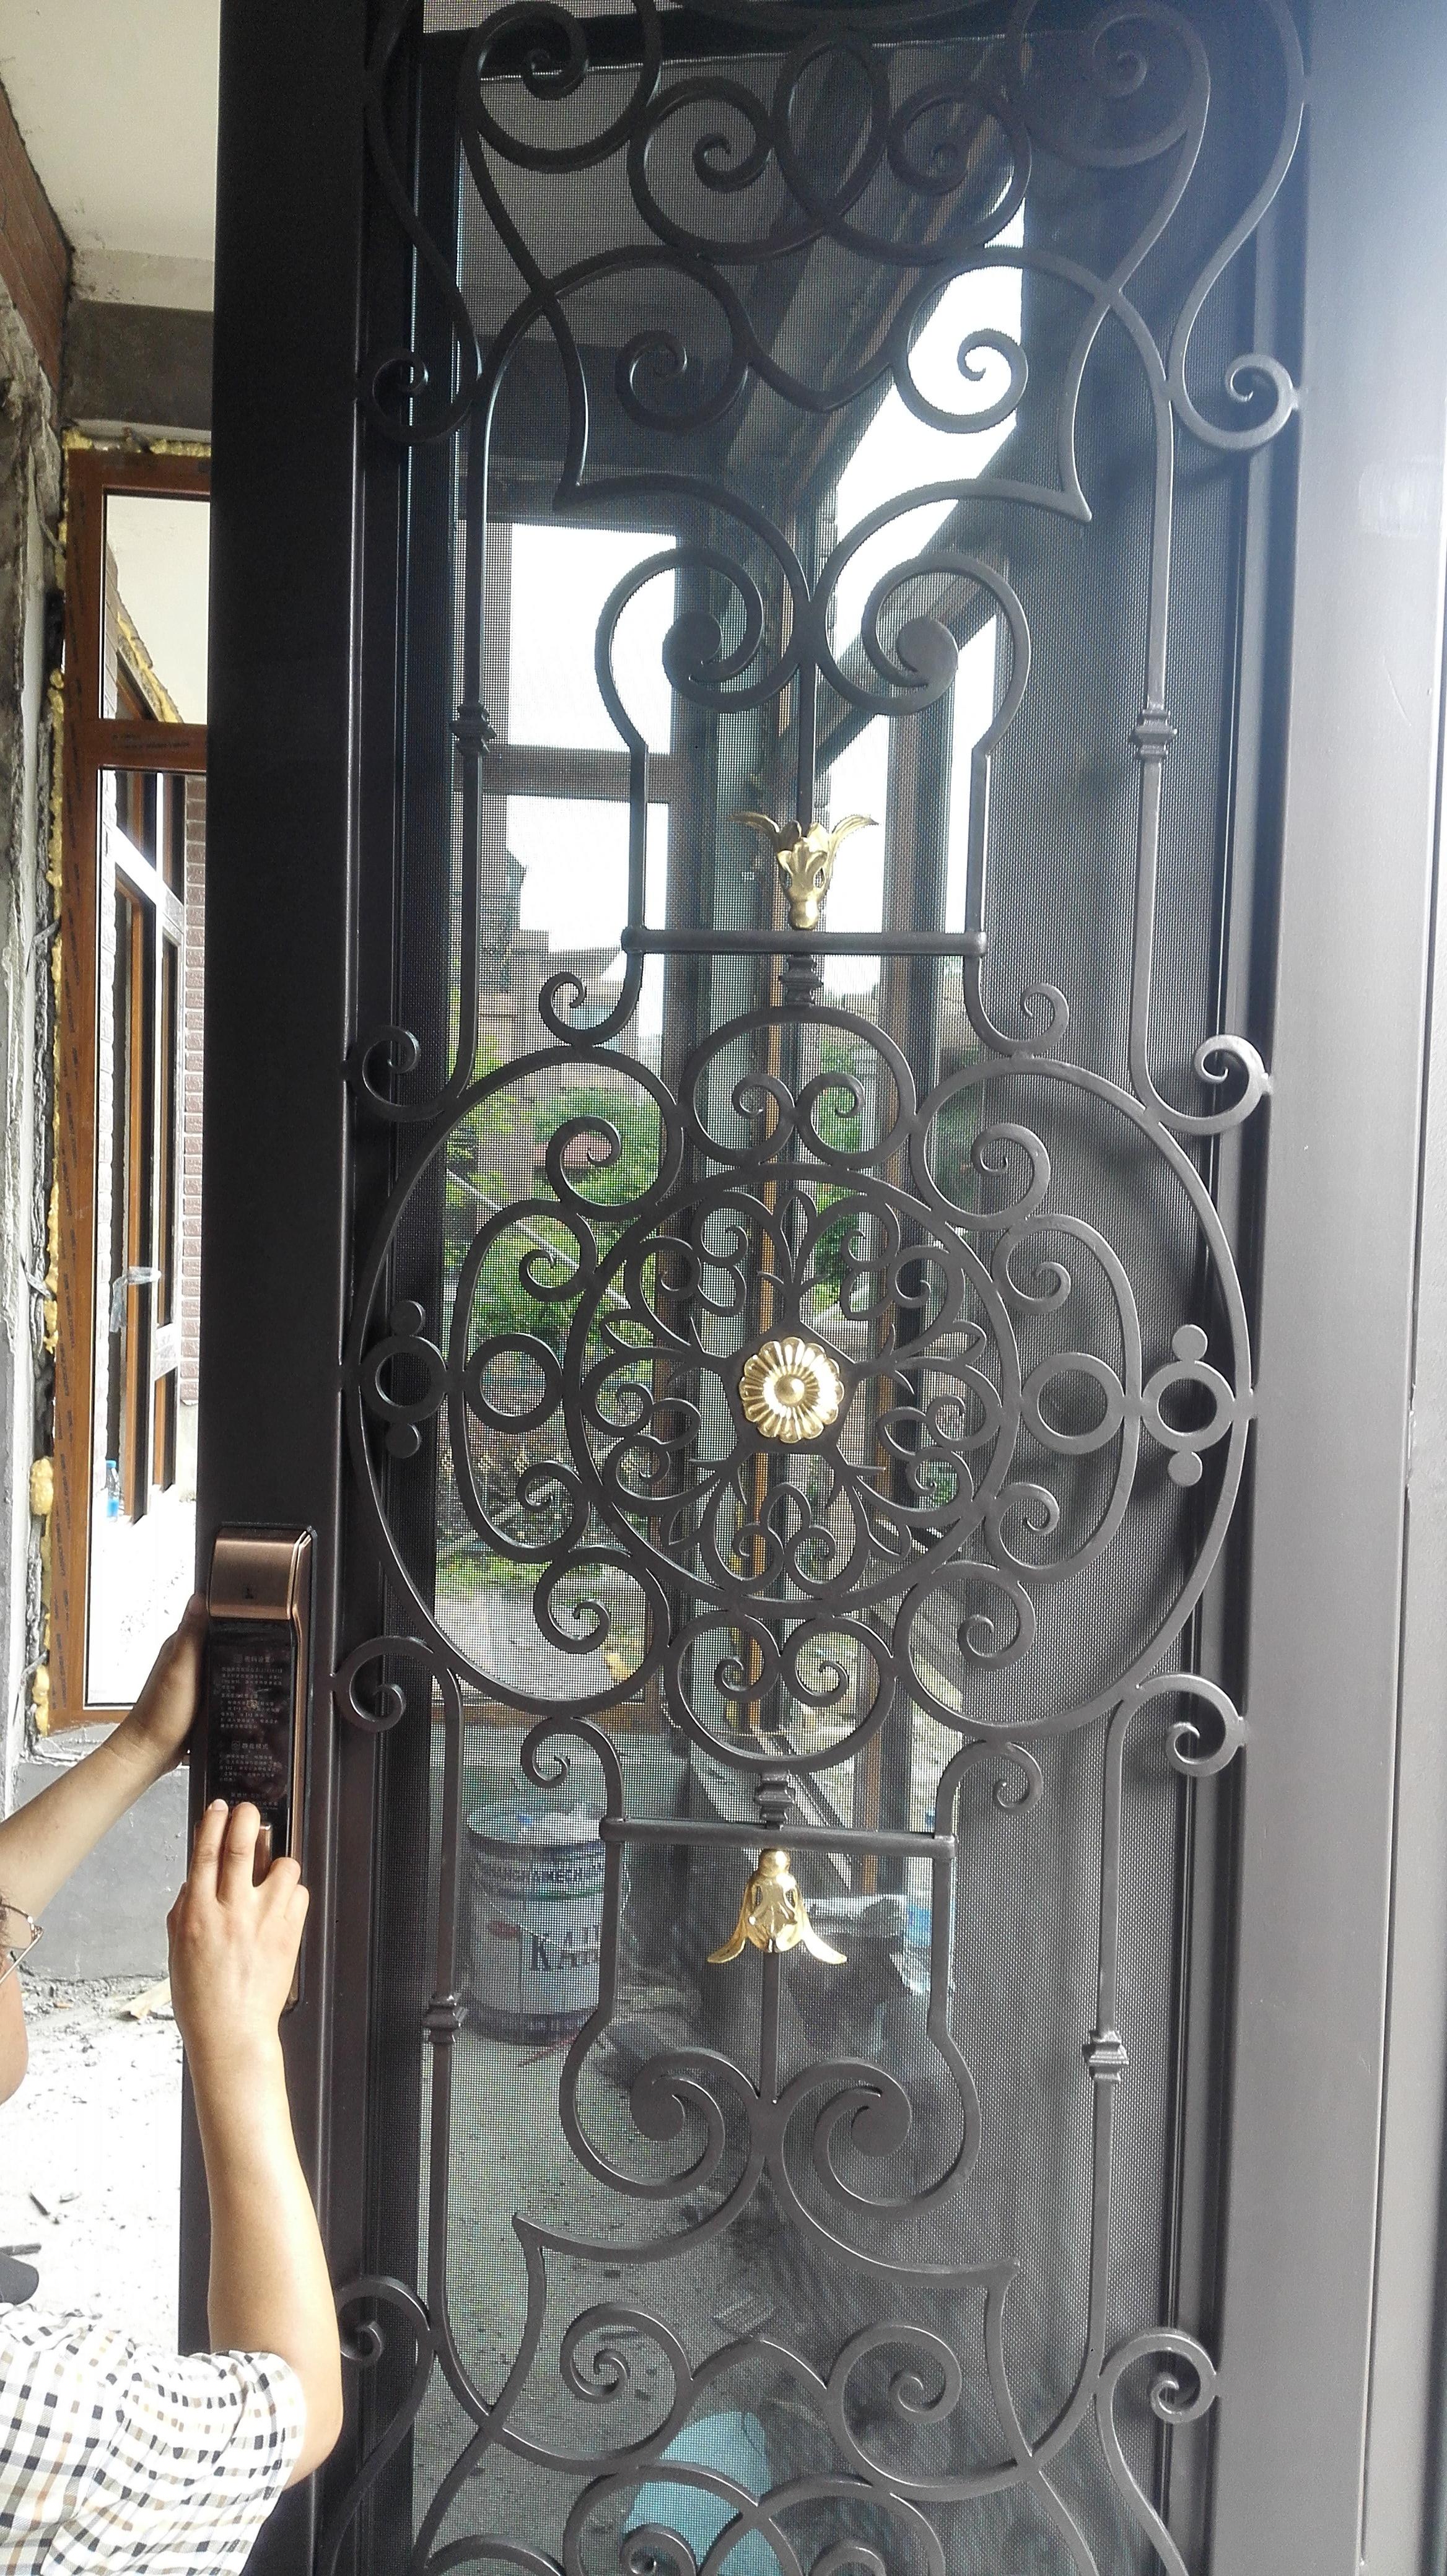 Hench 100% Steel Iron Doors  Model Hc-id69